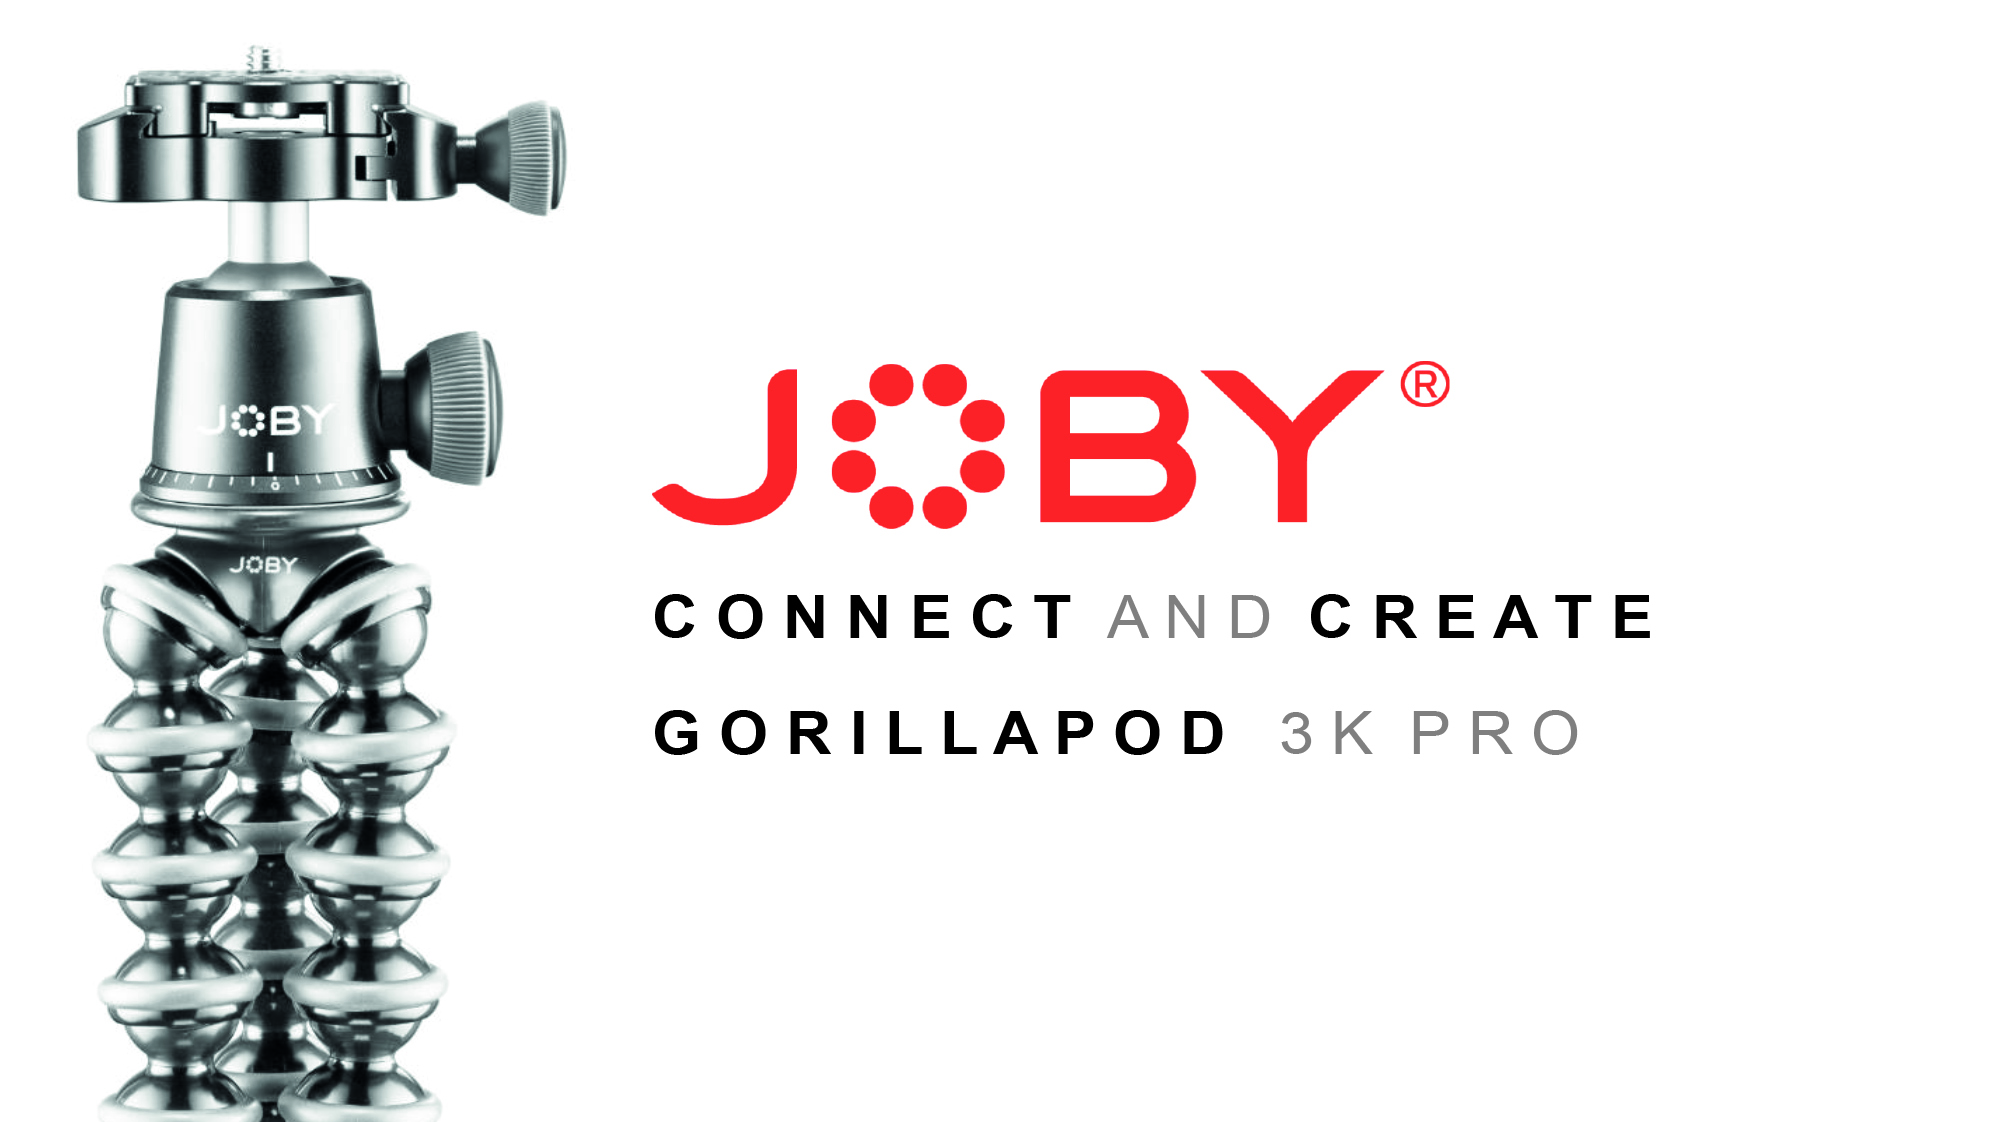 joby_3KPRO_slider